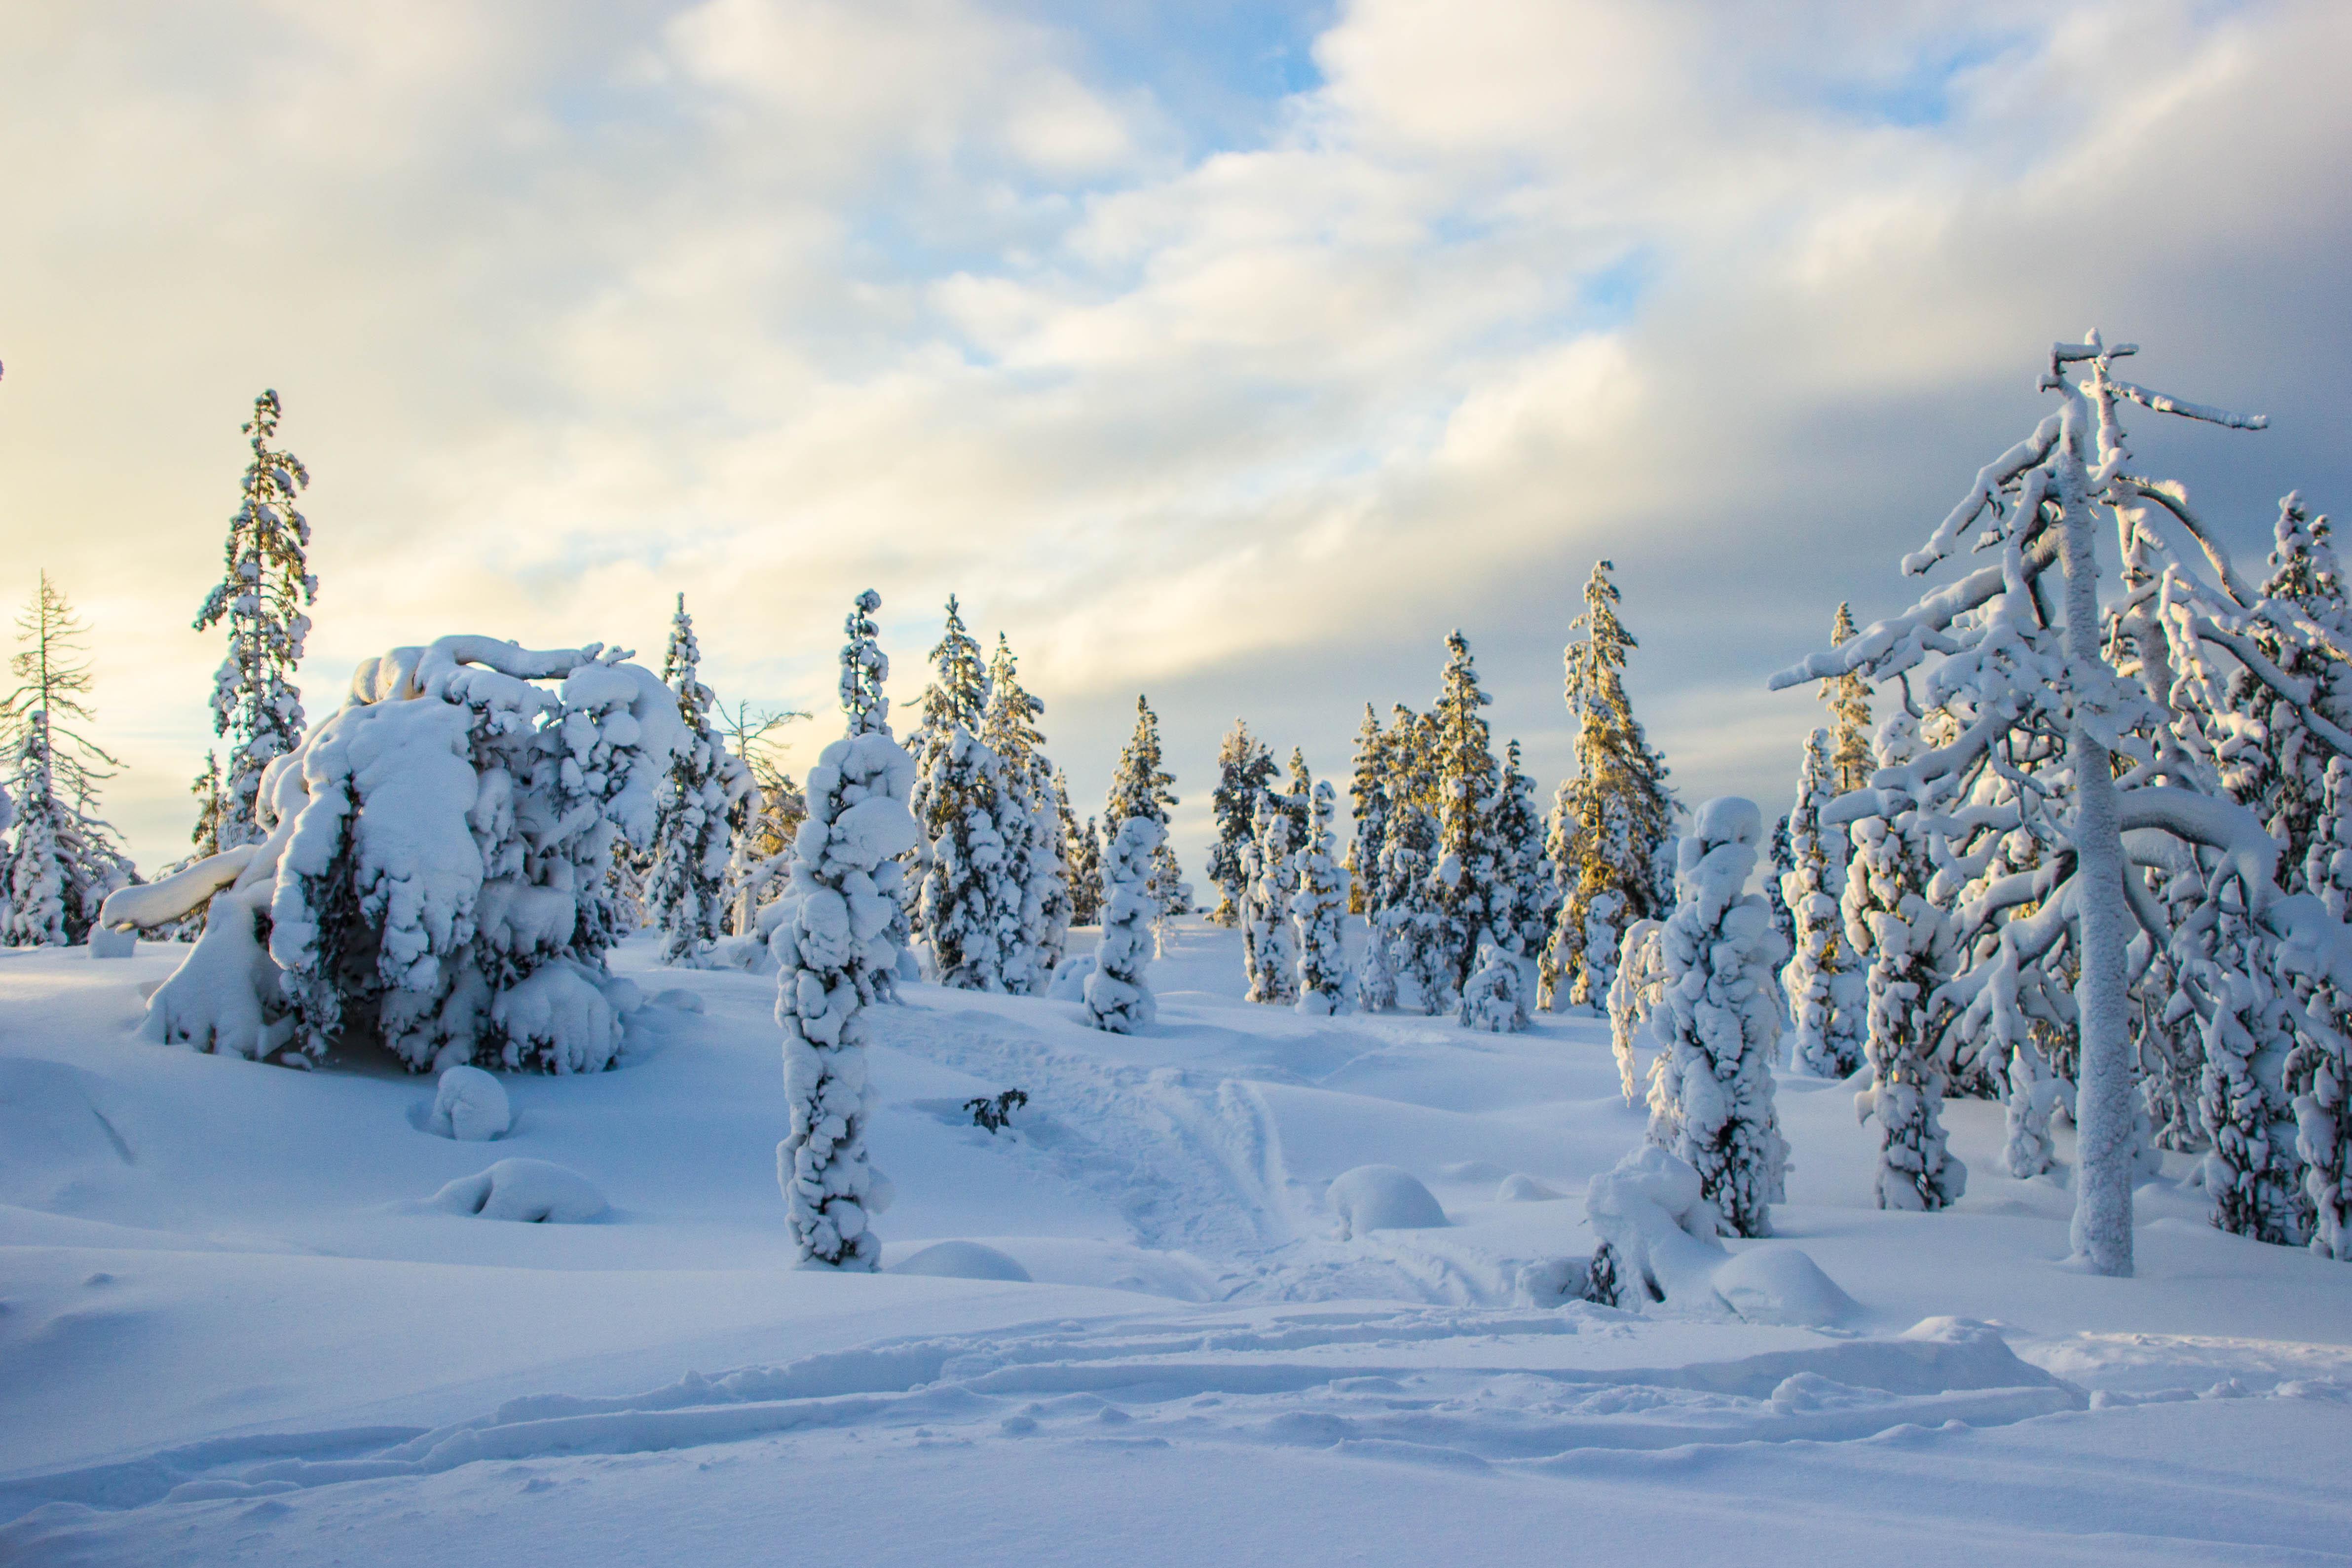 зима, сосны, ели, солнце, снег, закат, природа, кольский край, небо, мороз, кандалакша, пейзаж, сугробы, sun, nature, winter, sunset, landscape, Салтыкова Алёна